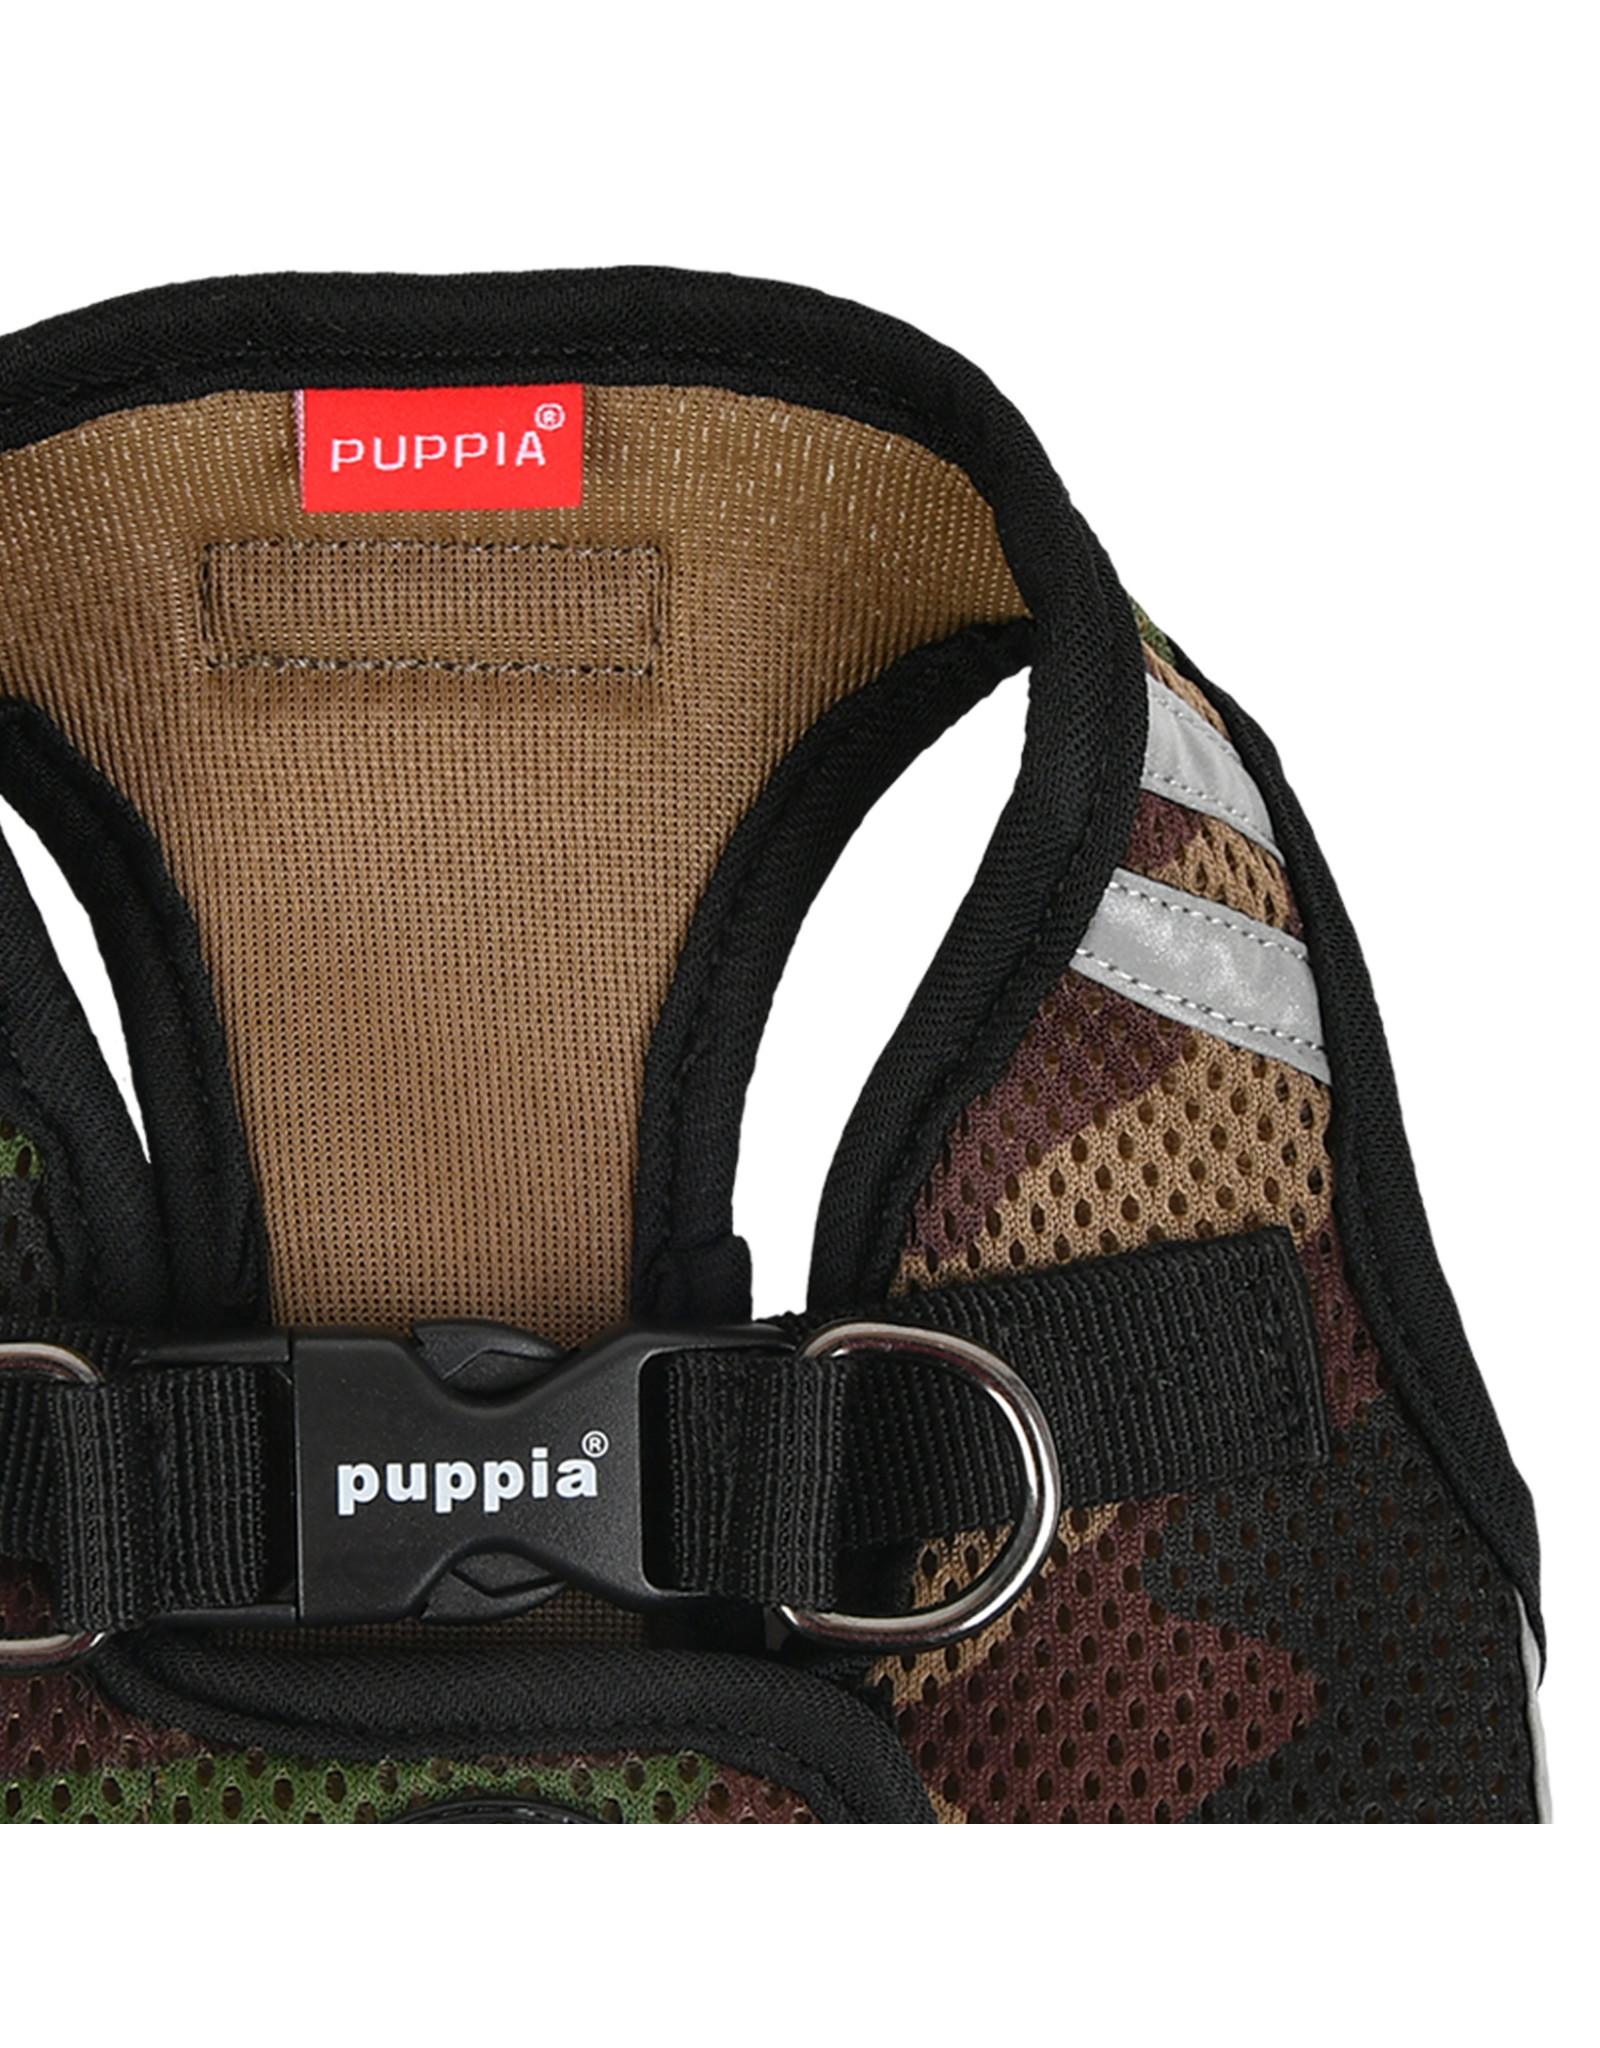 Puppia Puppia Soft Vest Harness PRO model B Camo